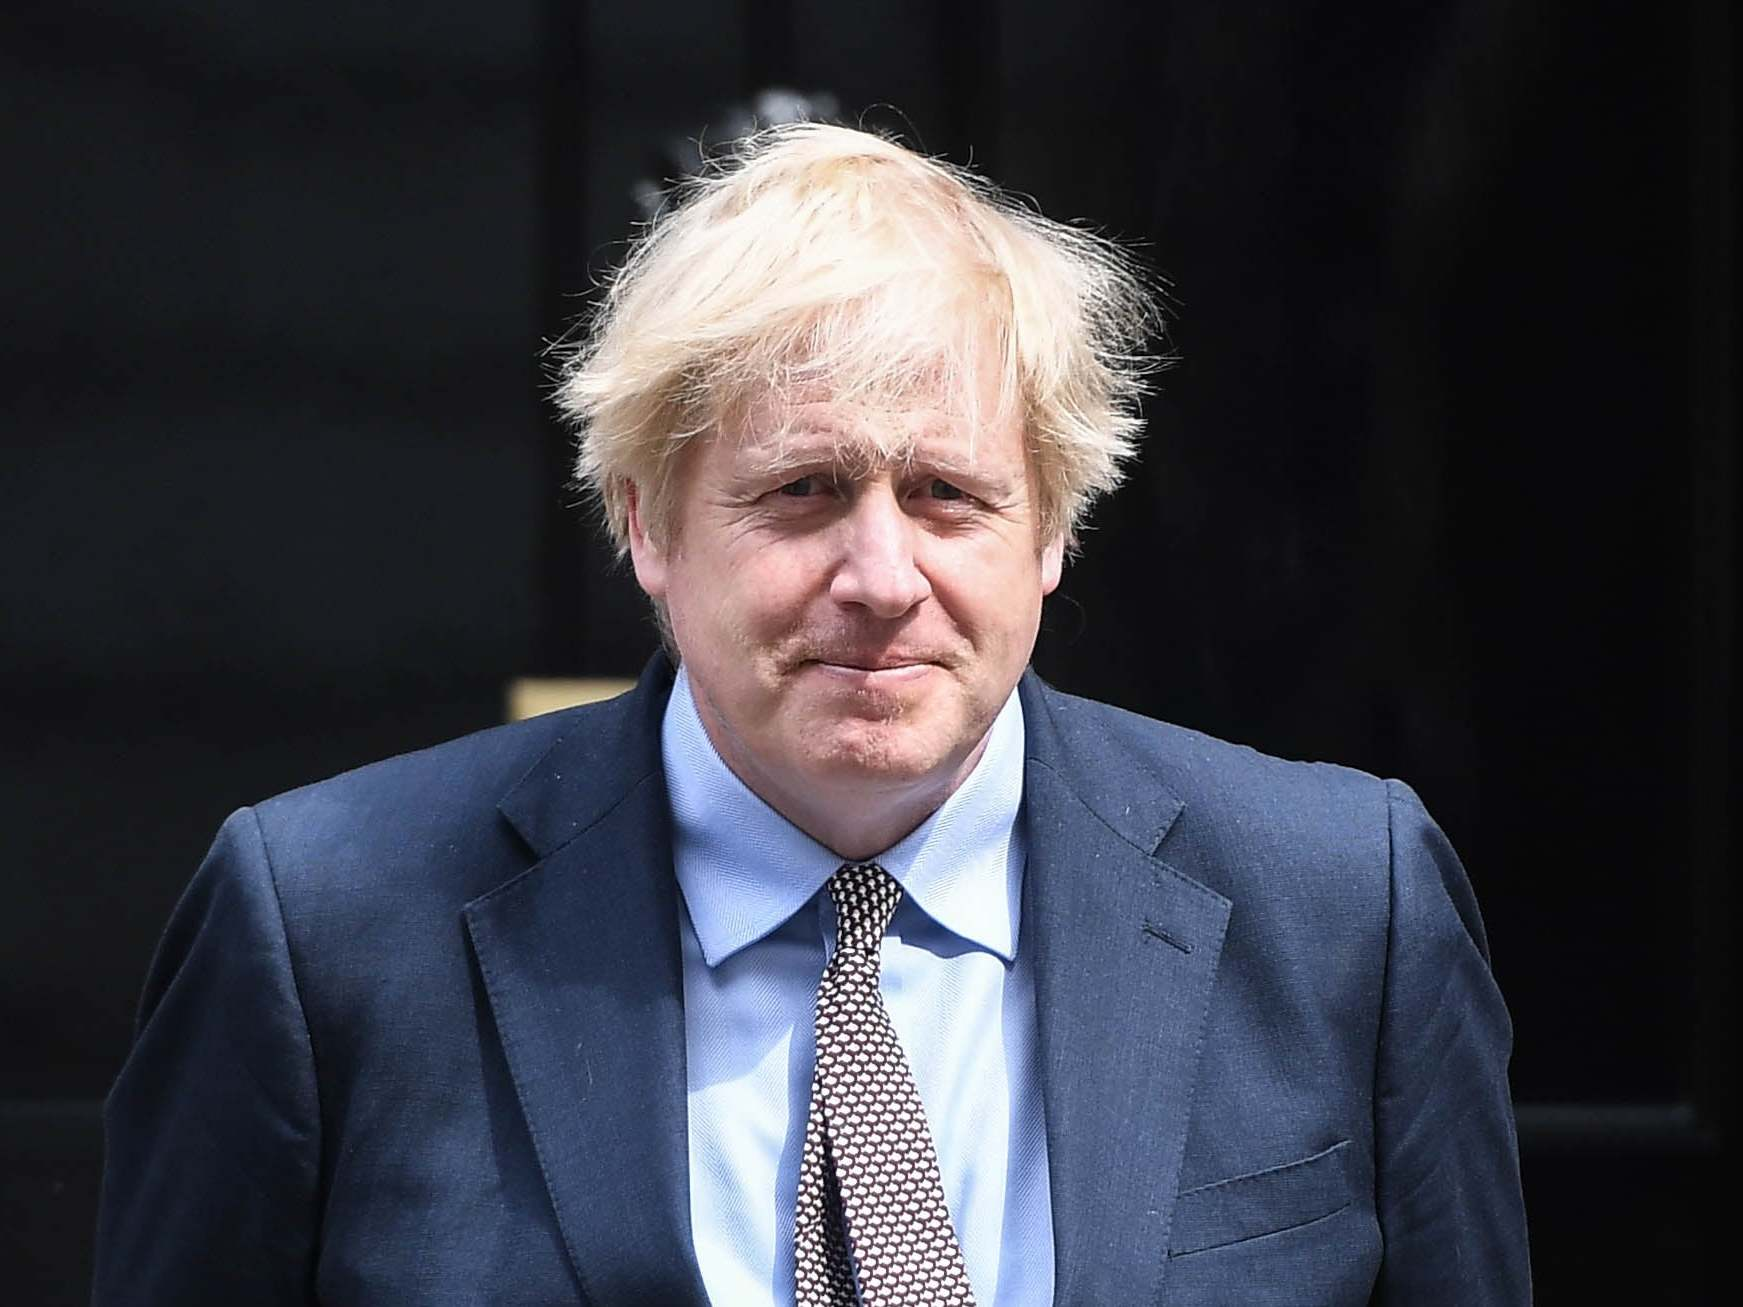 Coronavirus: Boris Johnson to unveil five-tier warning system for easing lockdown, urging public to 'stay alert' thumbnail